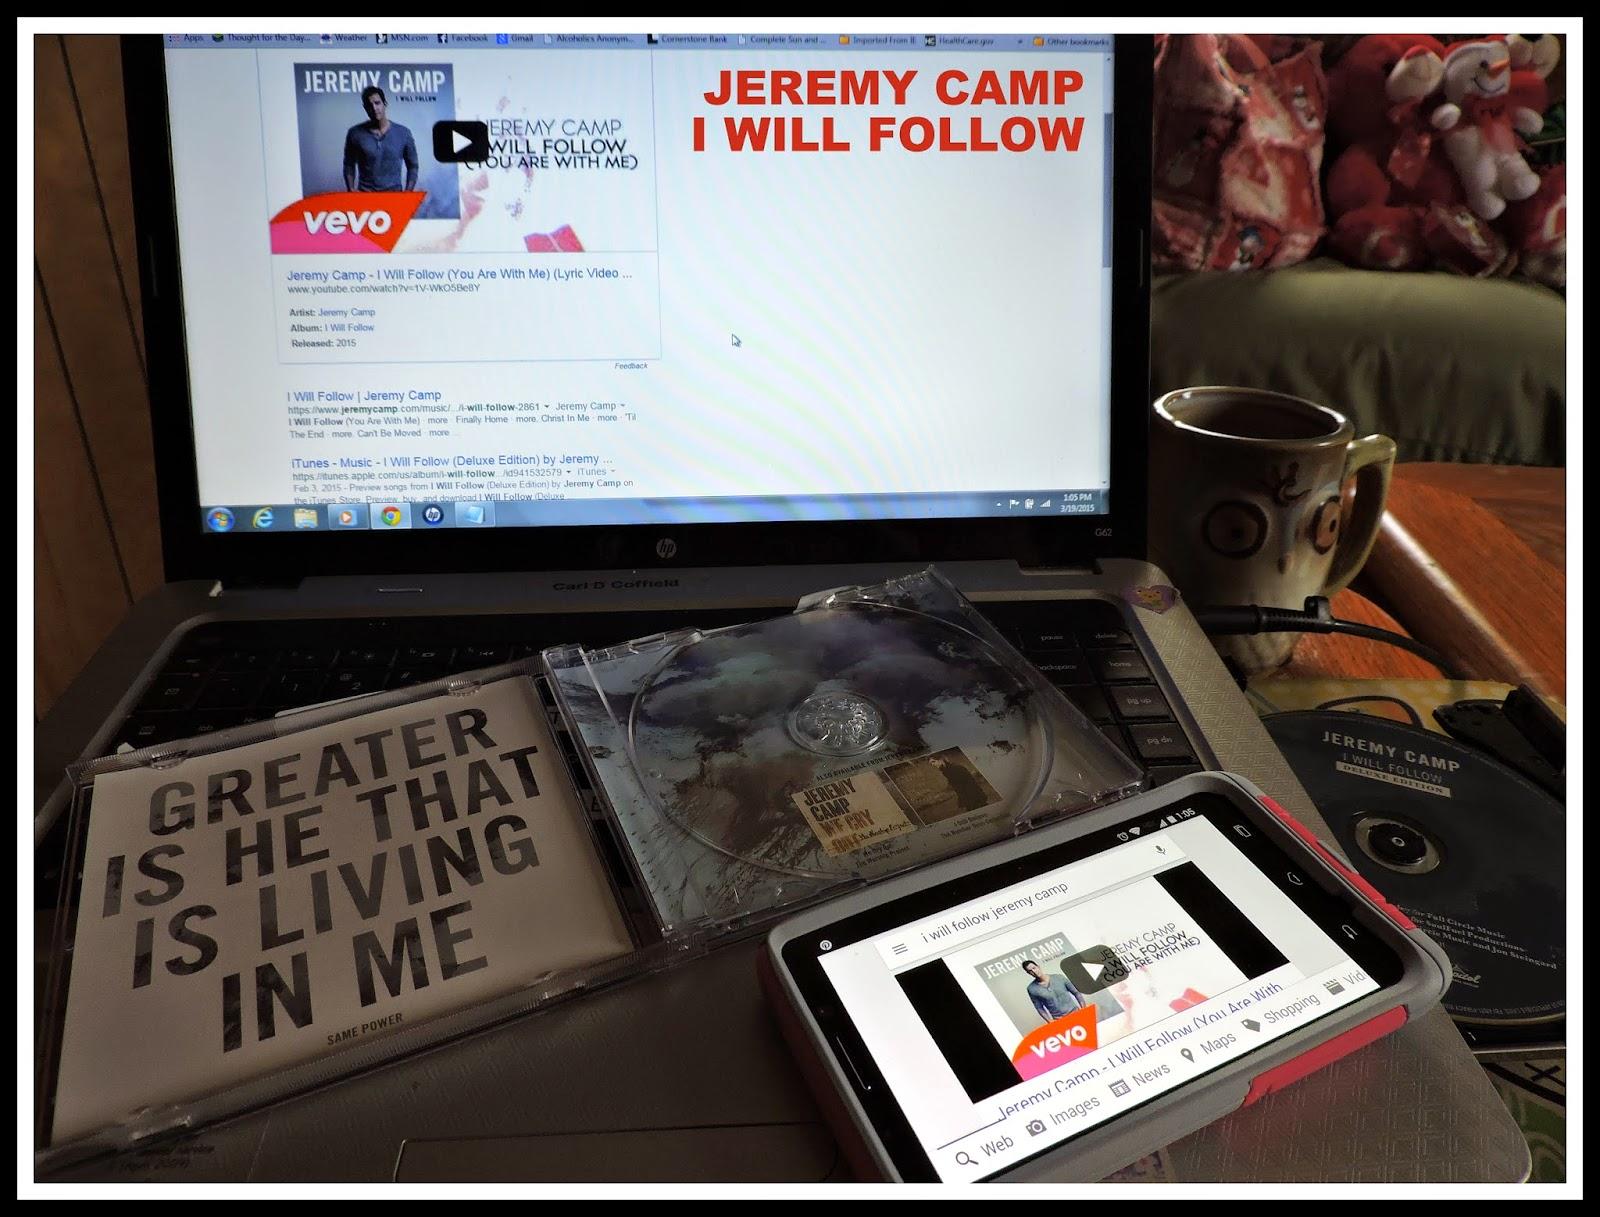 JEREMY CAMP - I WILL FOLLOW